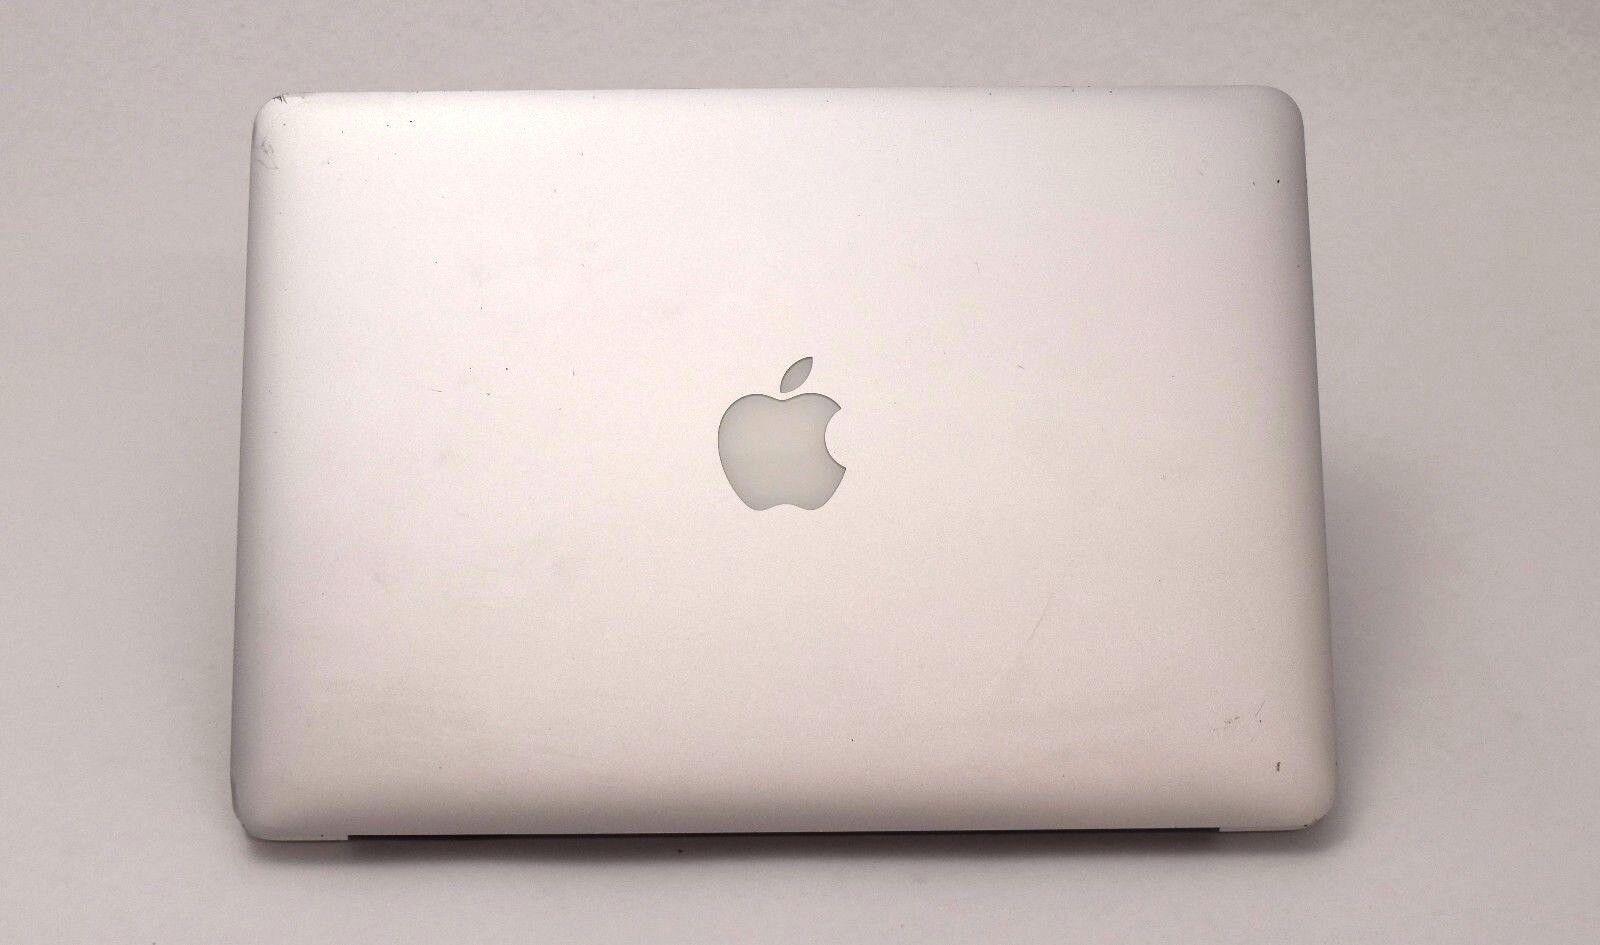 "Macbook - Apple MacBook Air 13.3"" Laptop | Intel i5-4250U | 4GB | 128GB SSD | A1466"